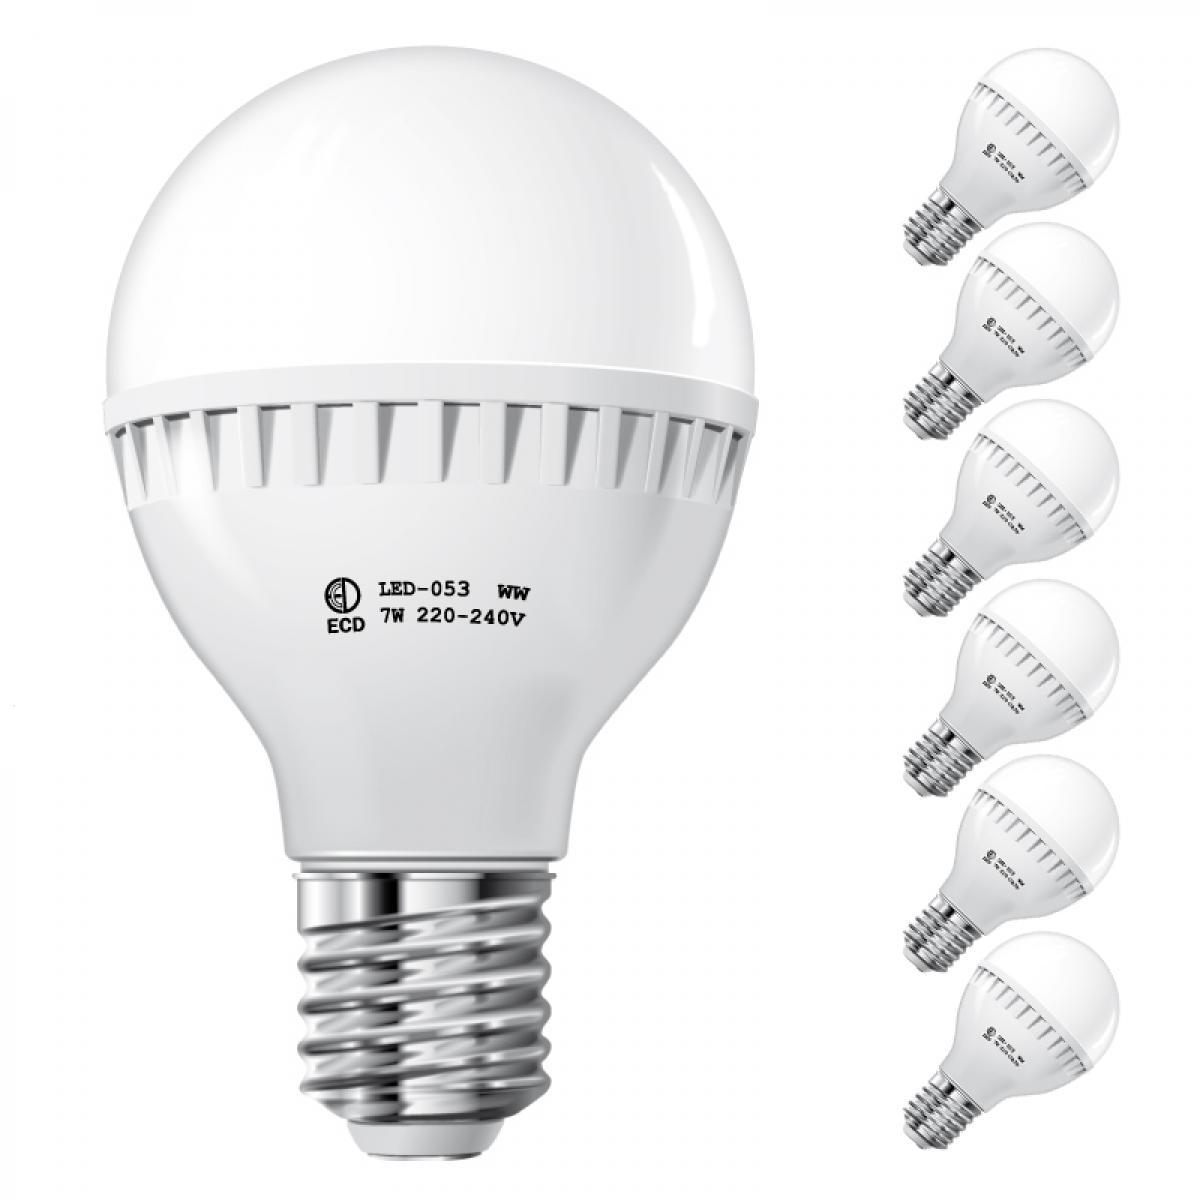 Ecd Germany ECD Germany 6 x 7W E27 LED Lampe | 6000 Kelvin Blanc Froid | 458 Lumens | 220-240 V | Remplace une Ampoule Halogène de 4